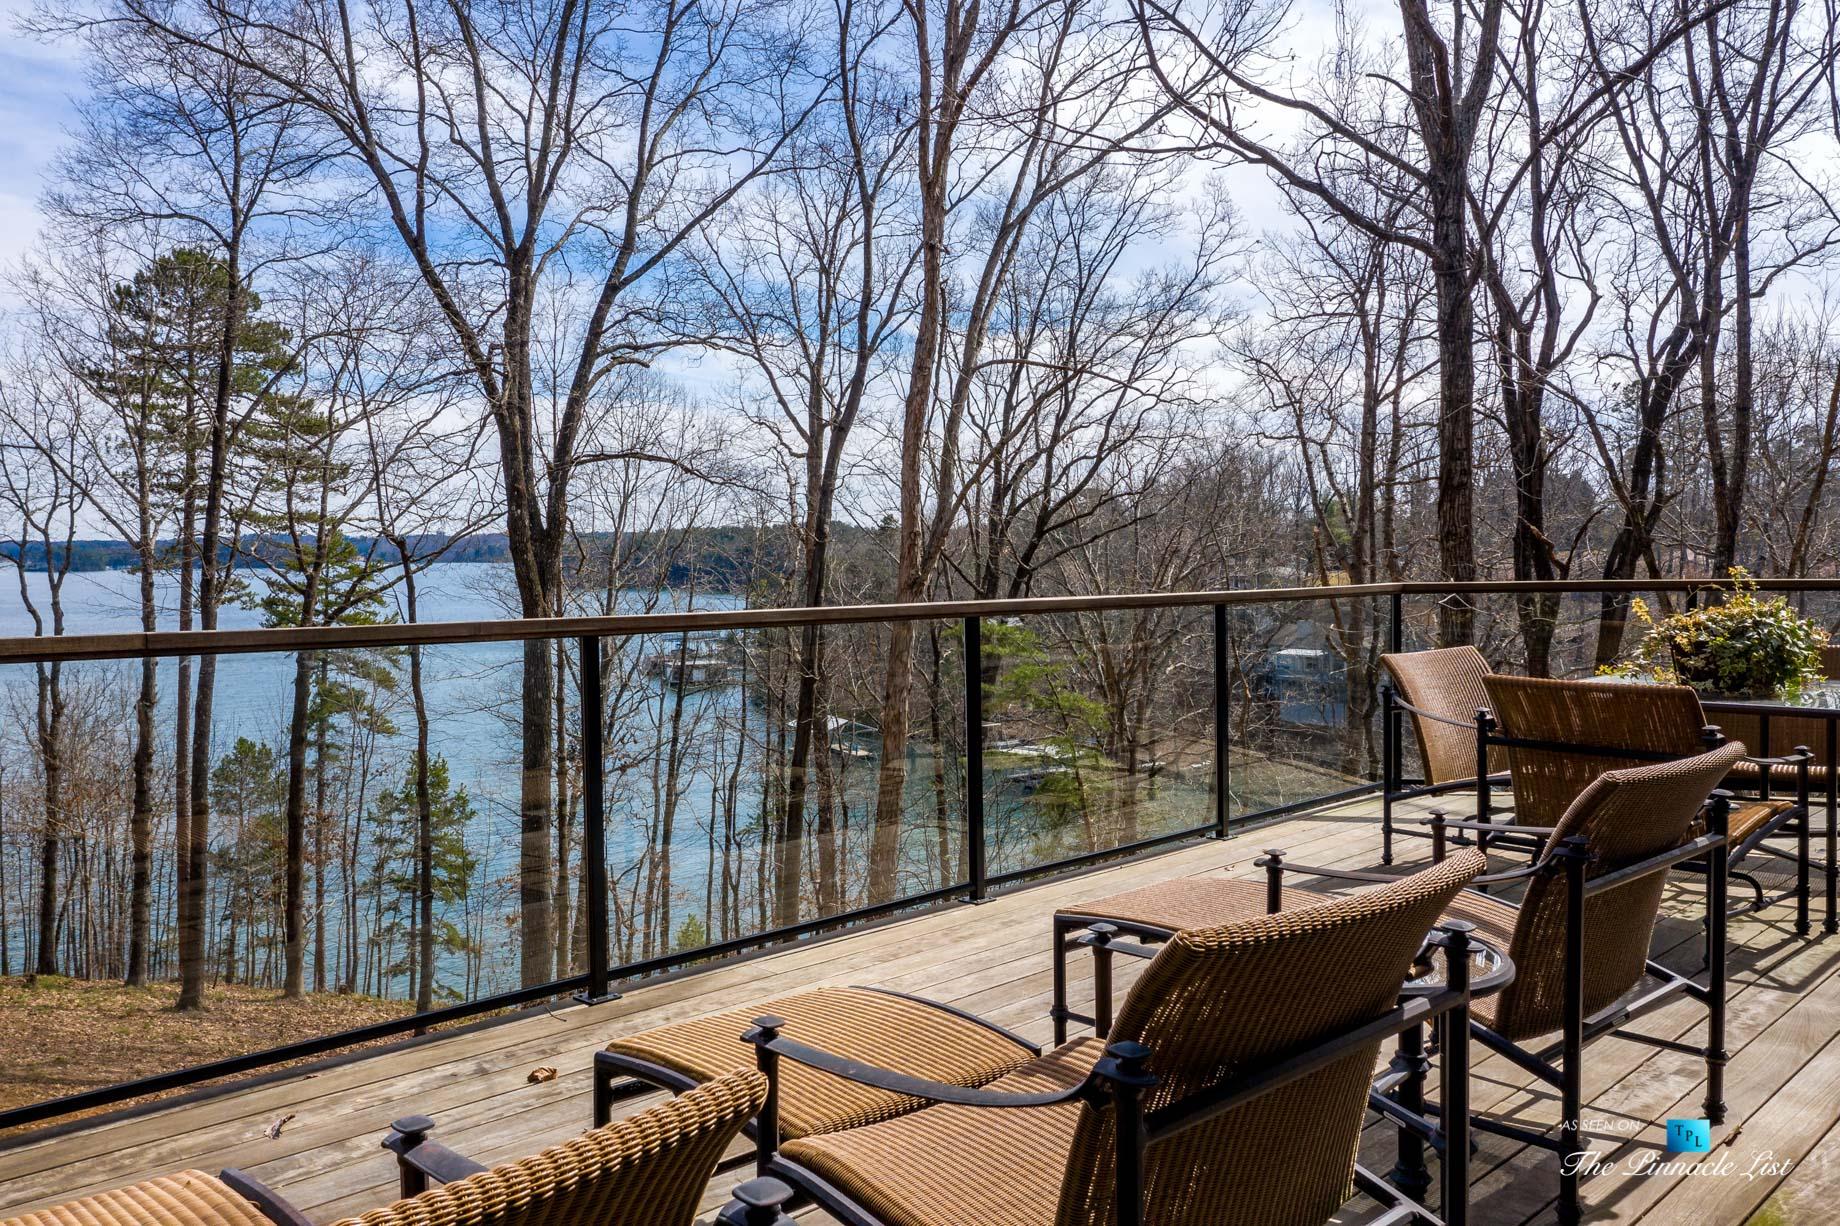 7860 Chestnut Hill Rd, Cumming, GA, USA – Exterior Deck Lake View – Luxury Real Estate – Lake Lanier Mid-Century Modern Stone Home